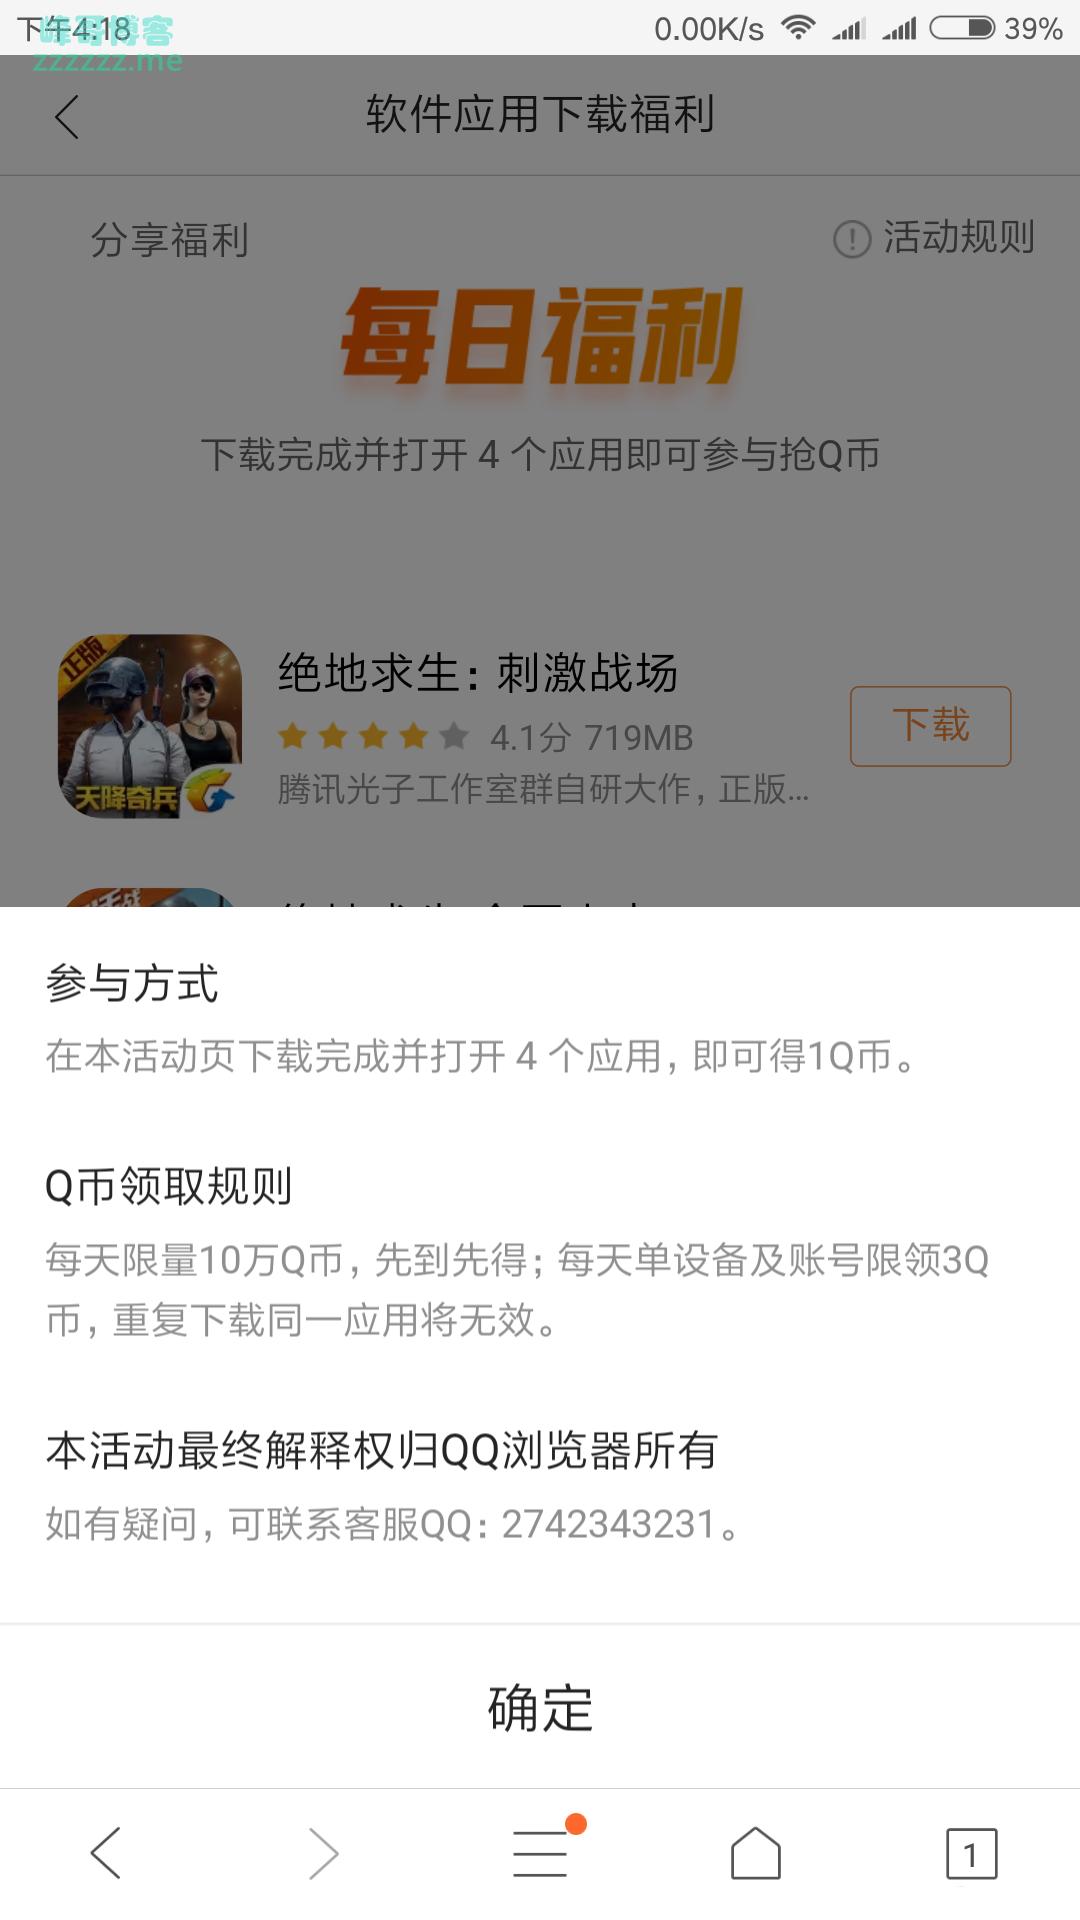 QQ浏览器每天领取3个Q币秒到!每天限量10W